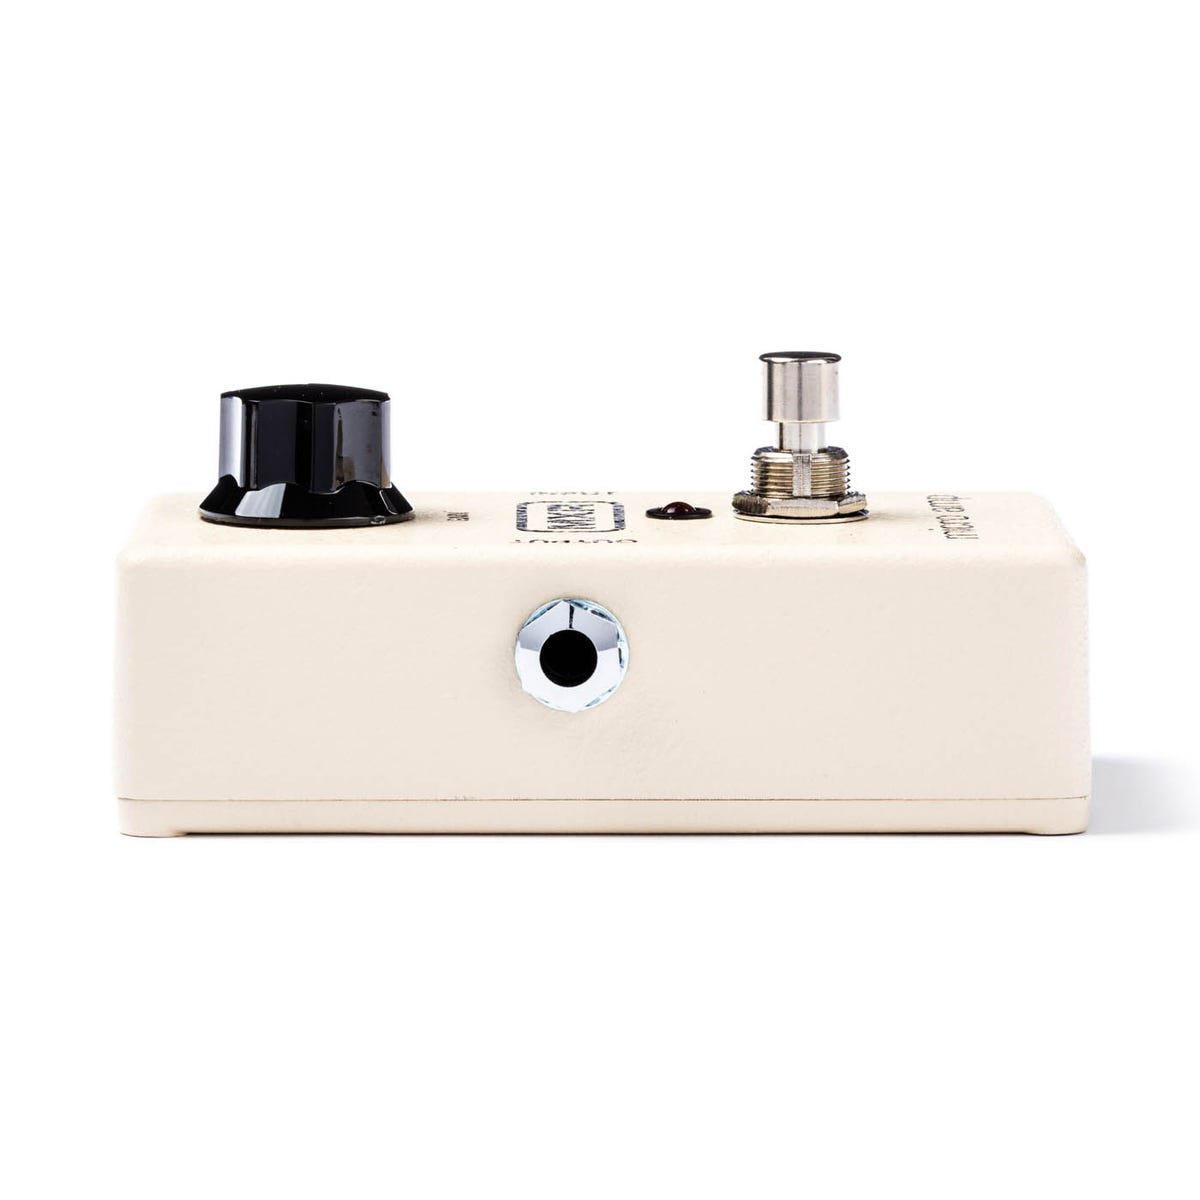 MXR Micro Amp Boost Pedal